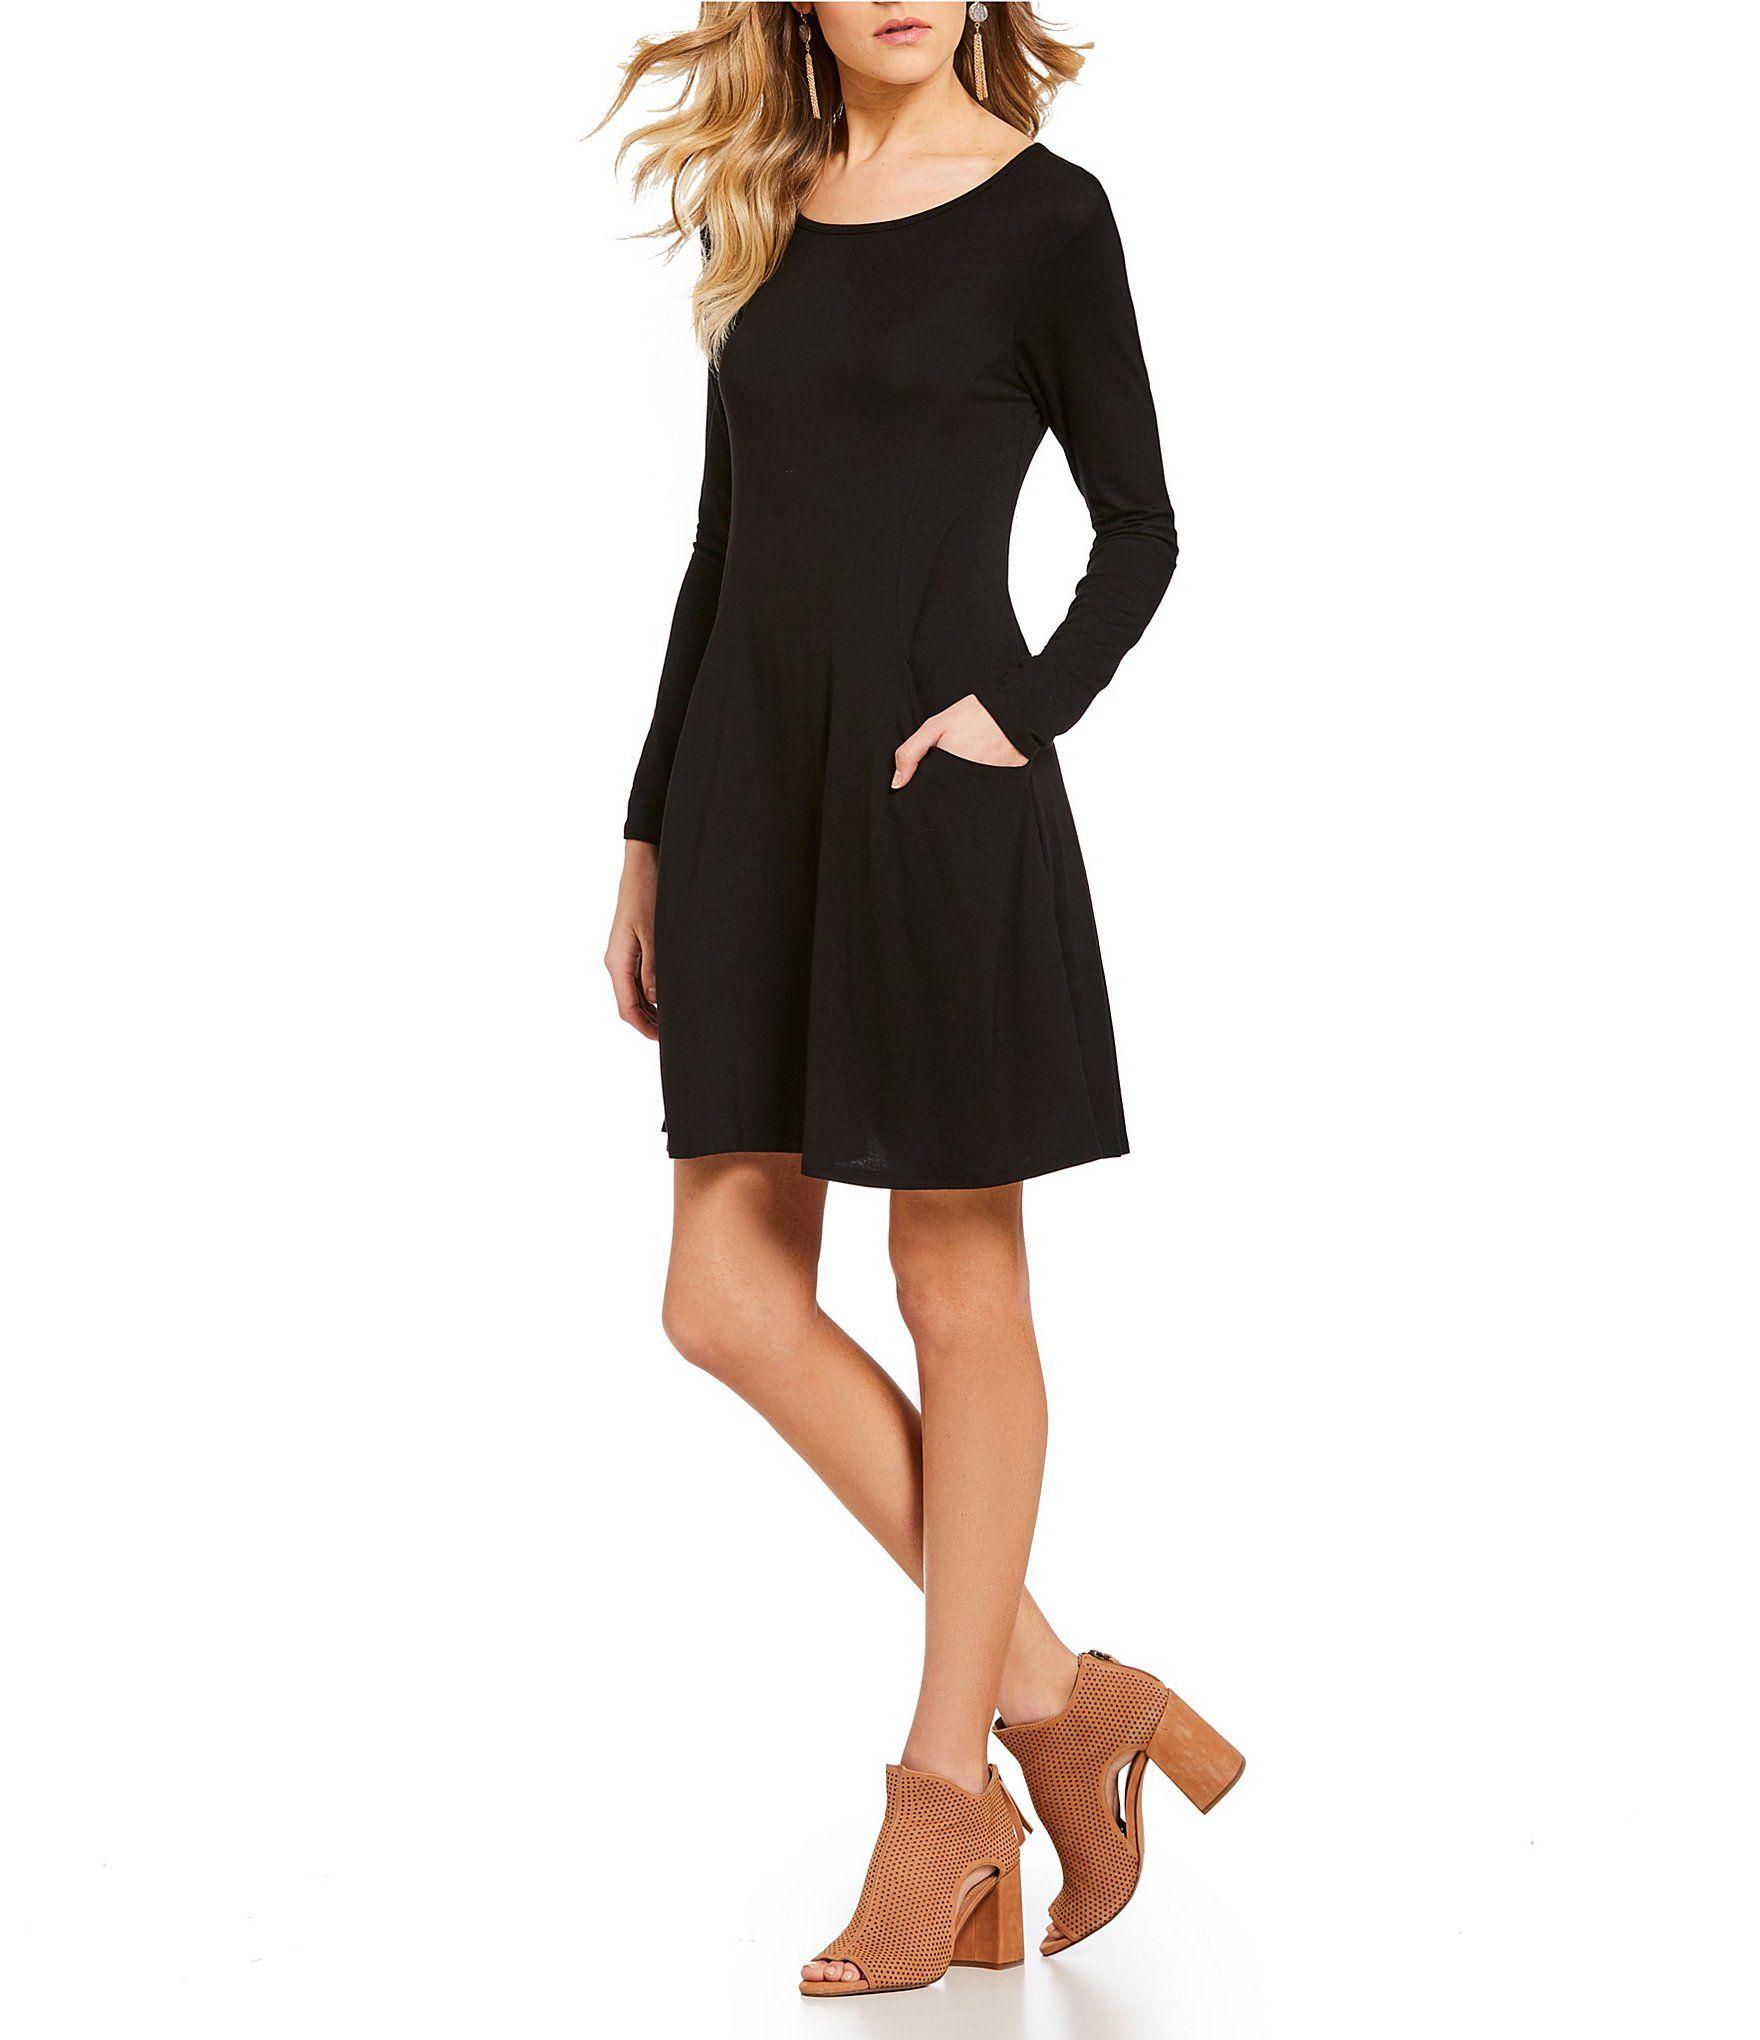 Moa moa long sleeve pocket swing dress dillards clothes